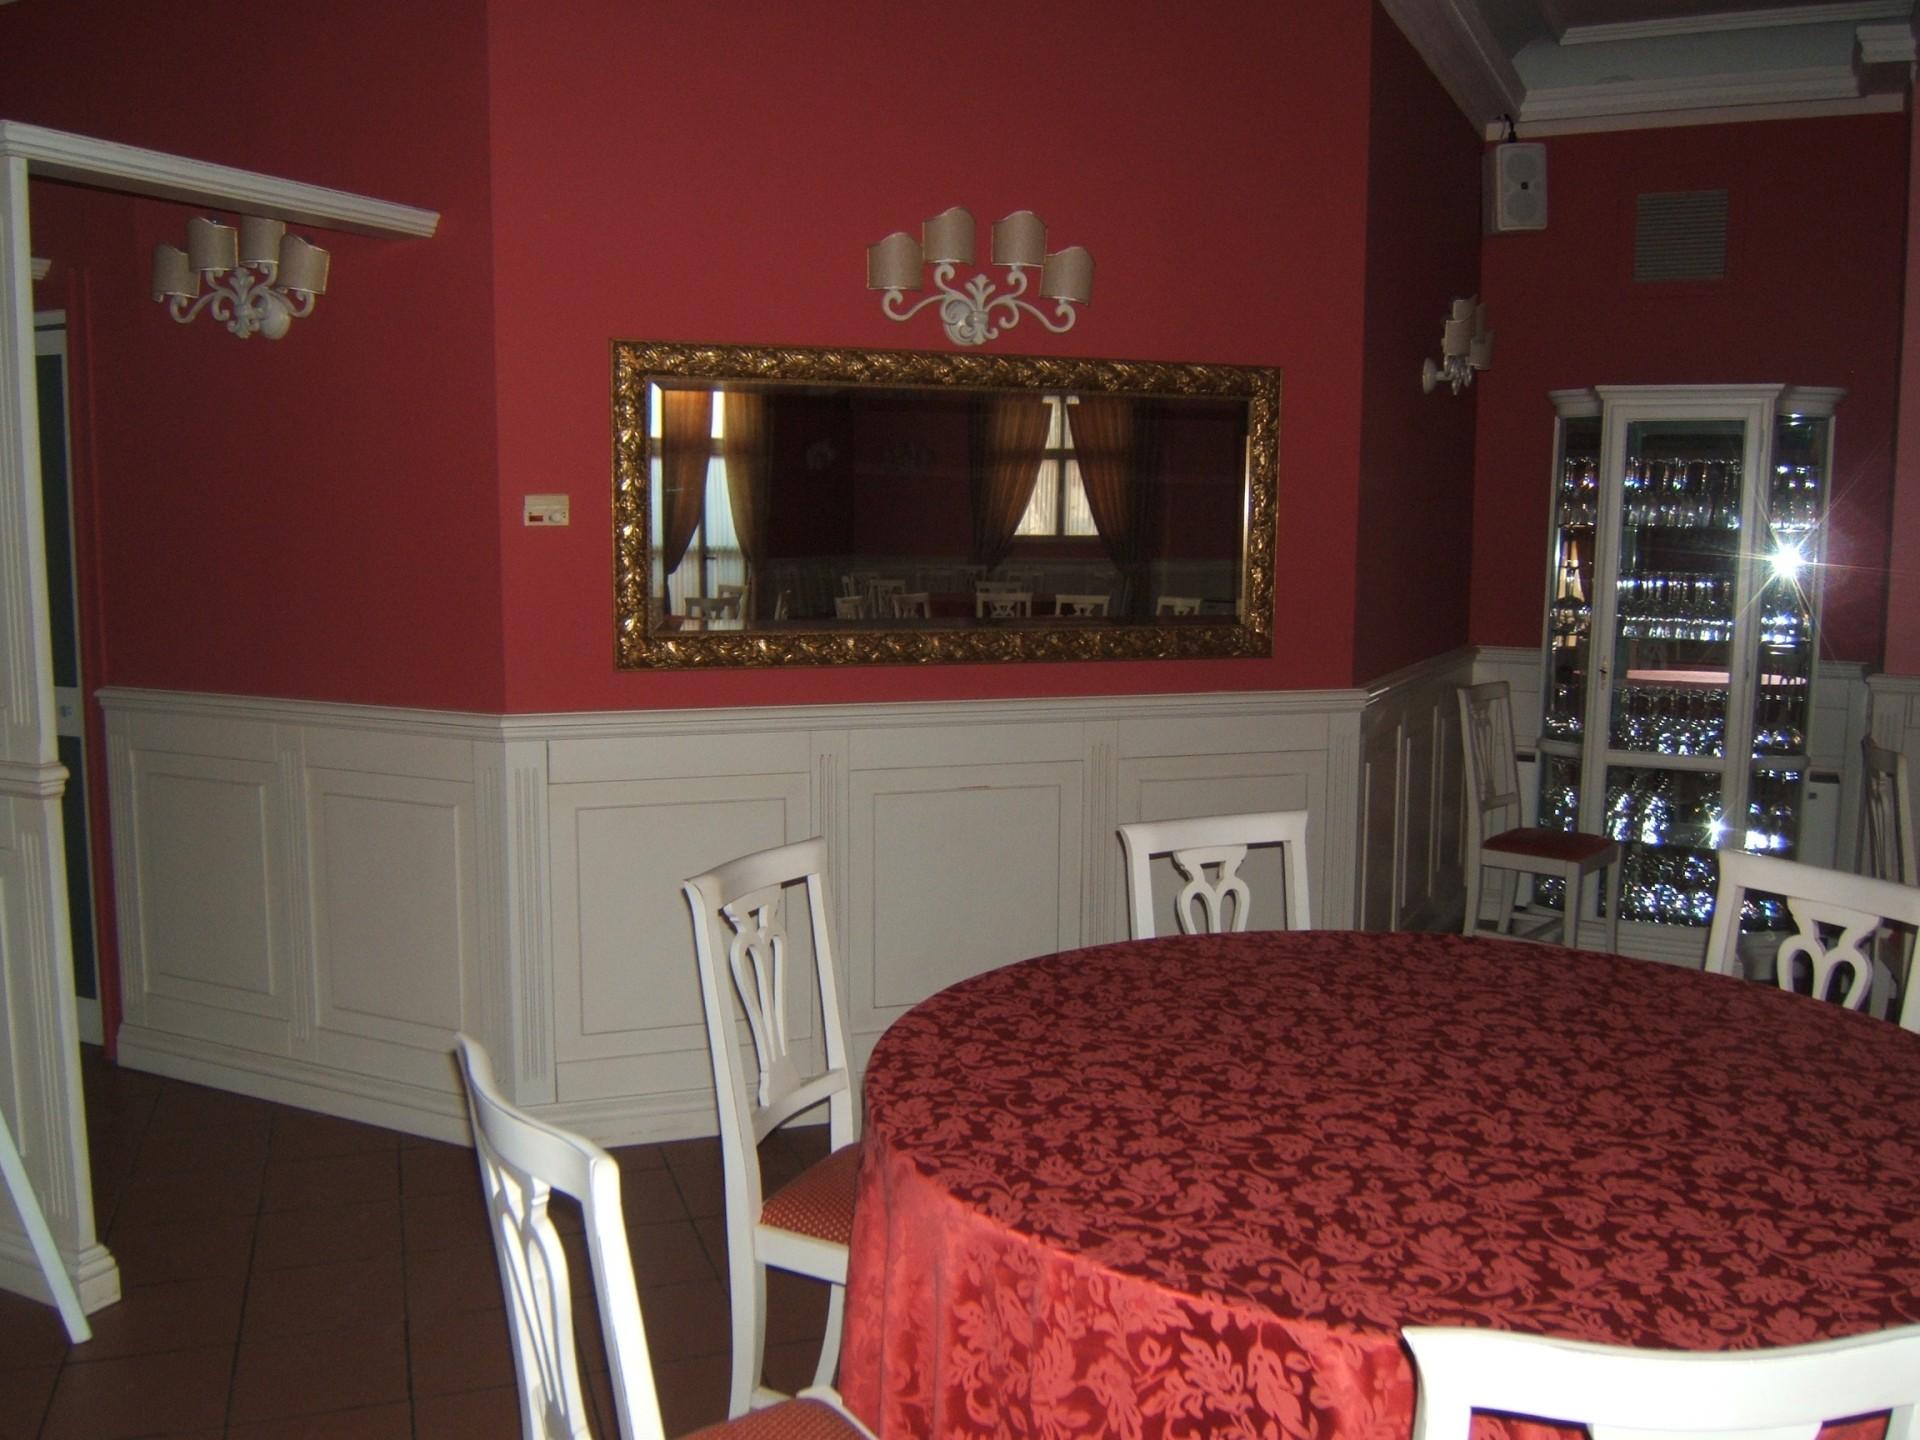 Arredamento per sala ristorante fadini mobili cerea verona - Arredamento sala ...